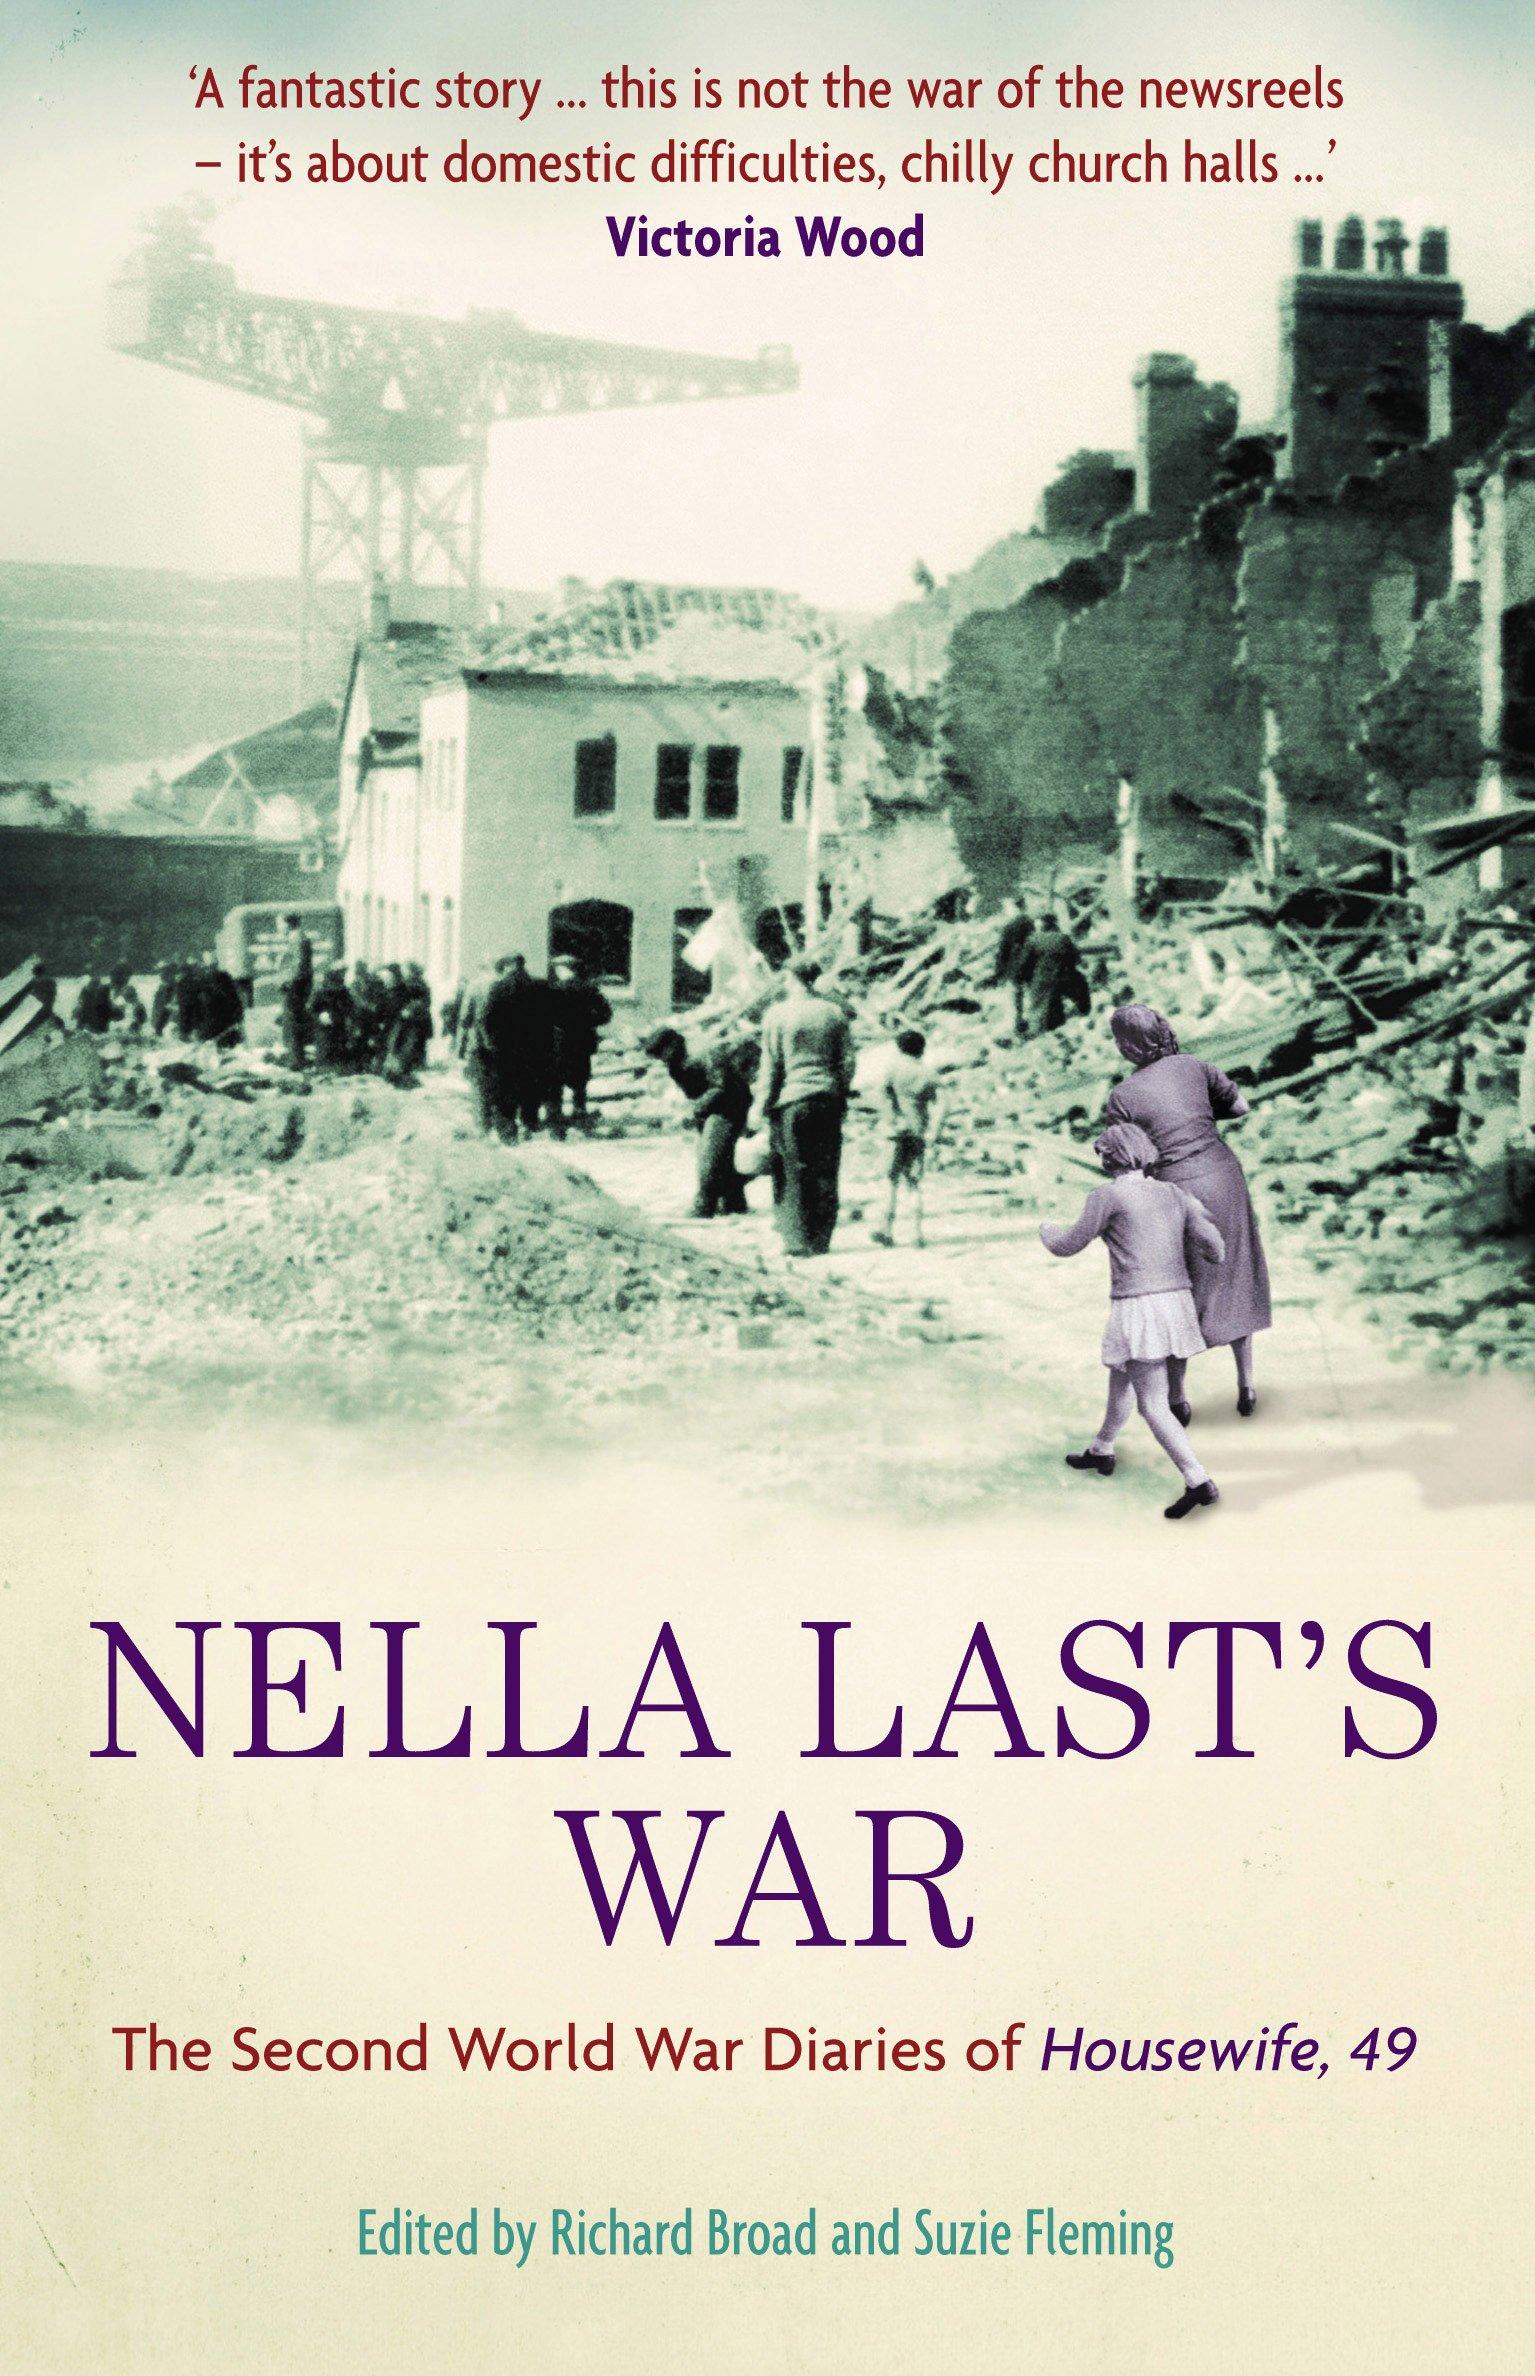 Nella Last's War: The Second World War Diaries of 'Housewife, 49': Amazon.co.uk:  Last, Nella, Broad, Richard, Fleming, Suzie: 8601404413353: Books